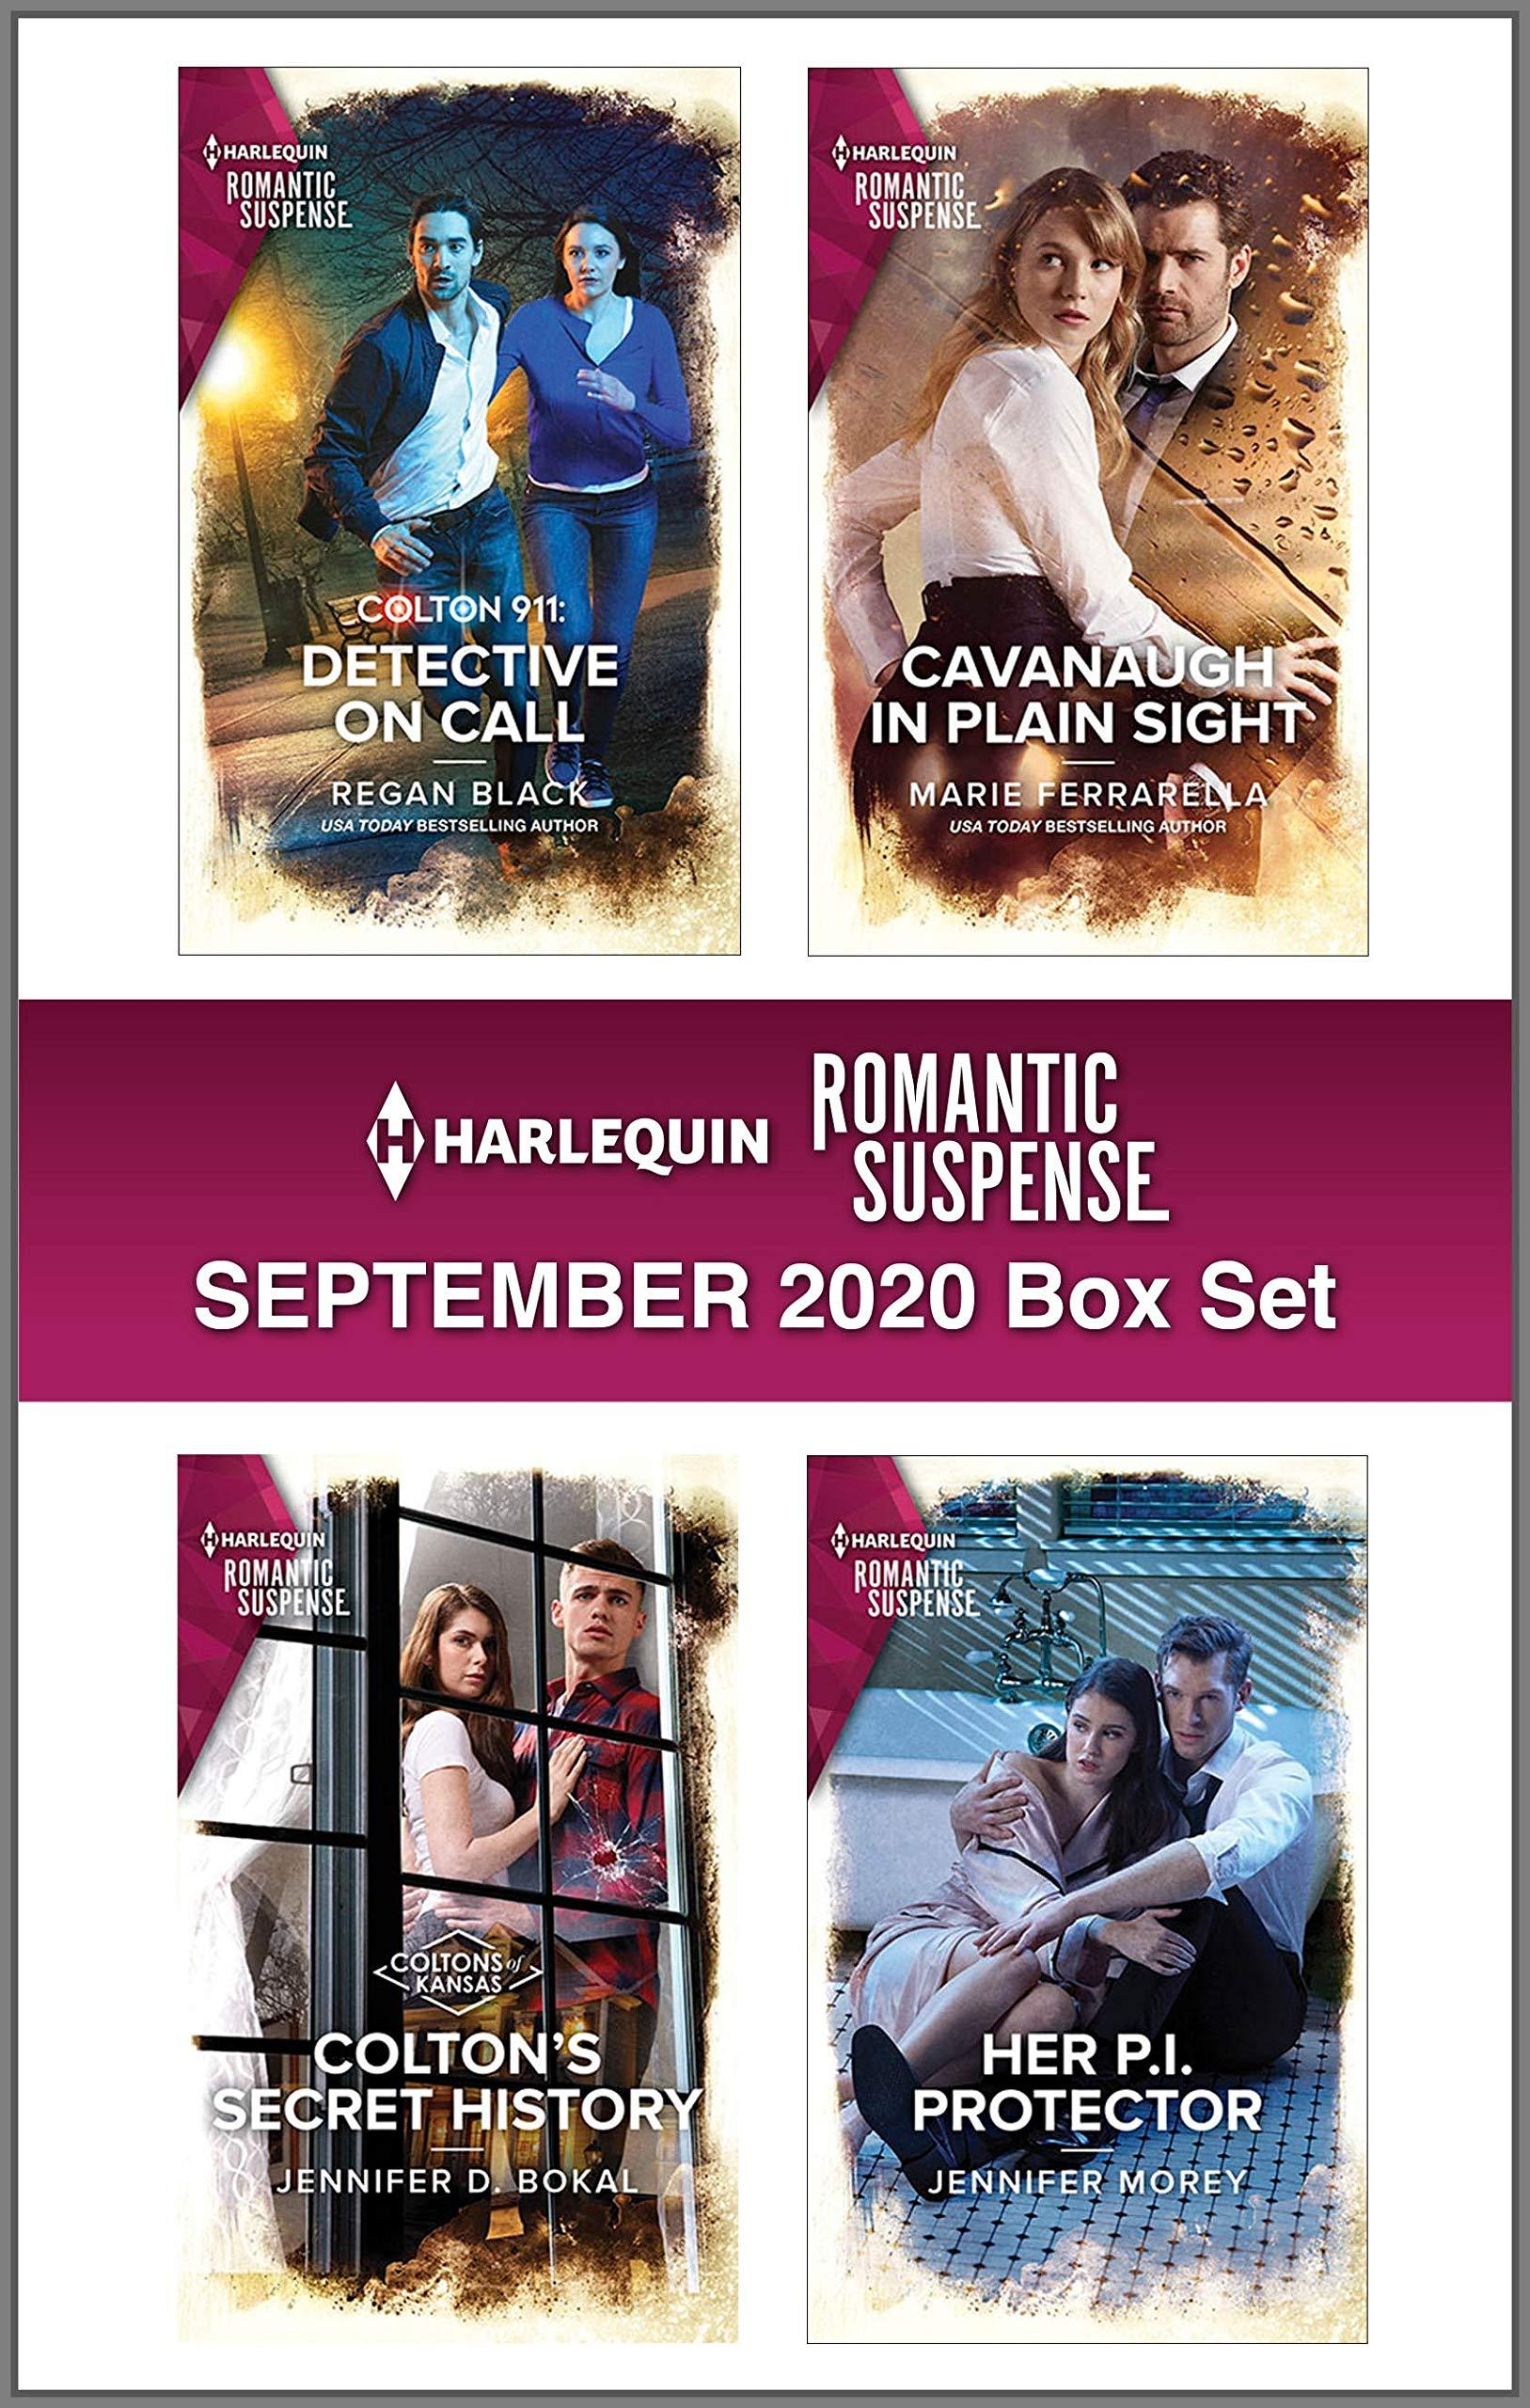 Harlequin Romantic Suspense September 2020 Box Set